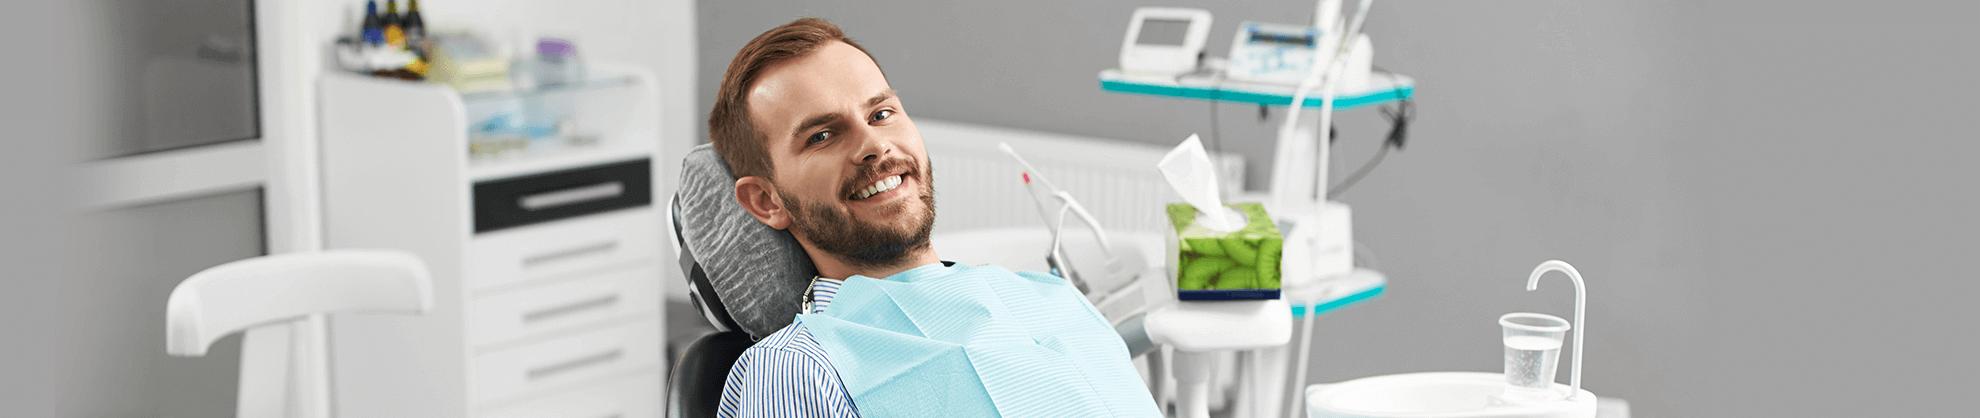 Седативная стоматология в Кипарисе, штат Техас